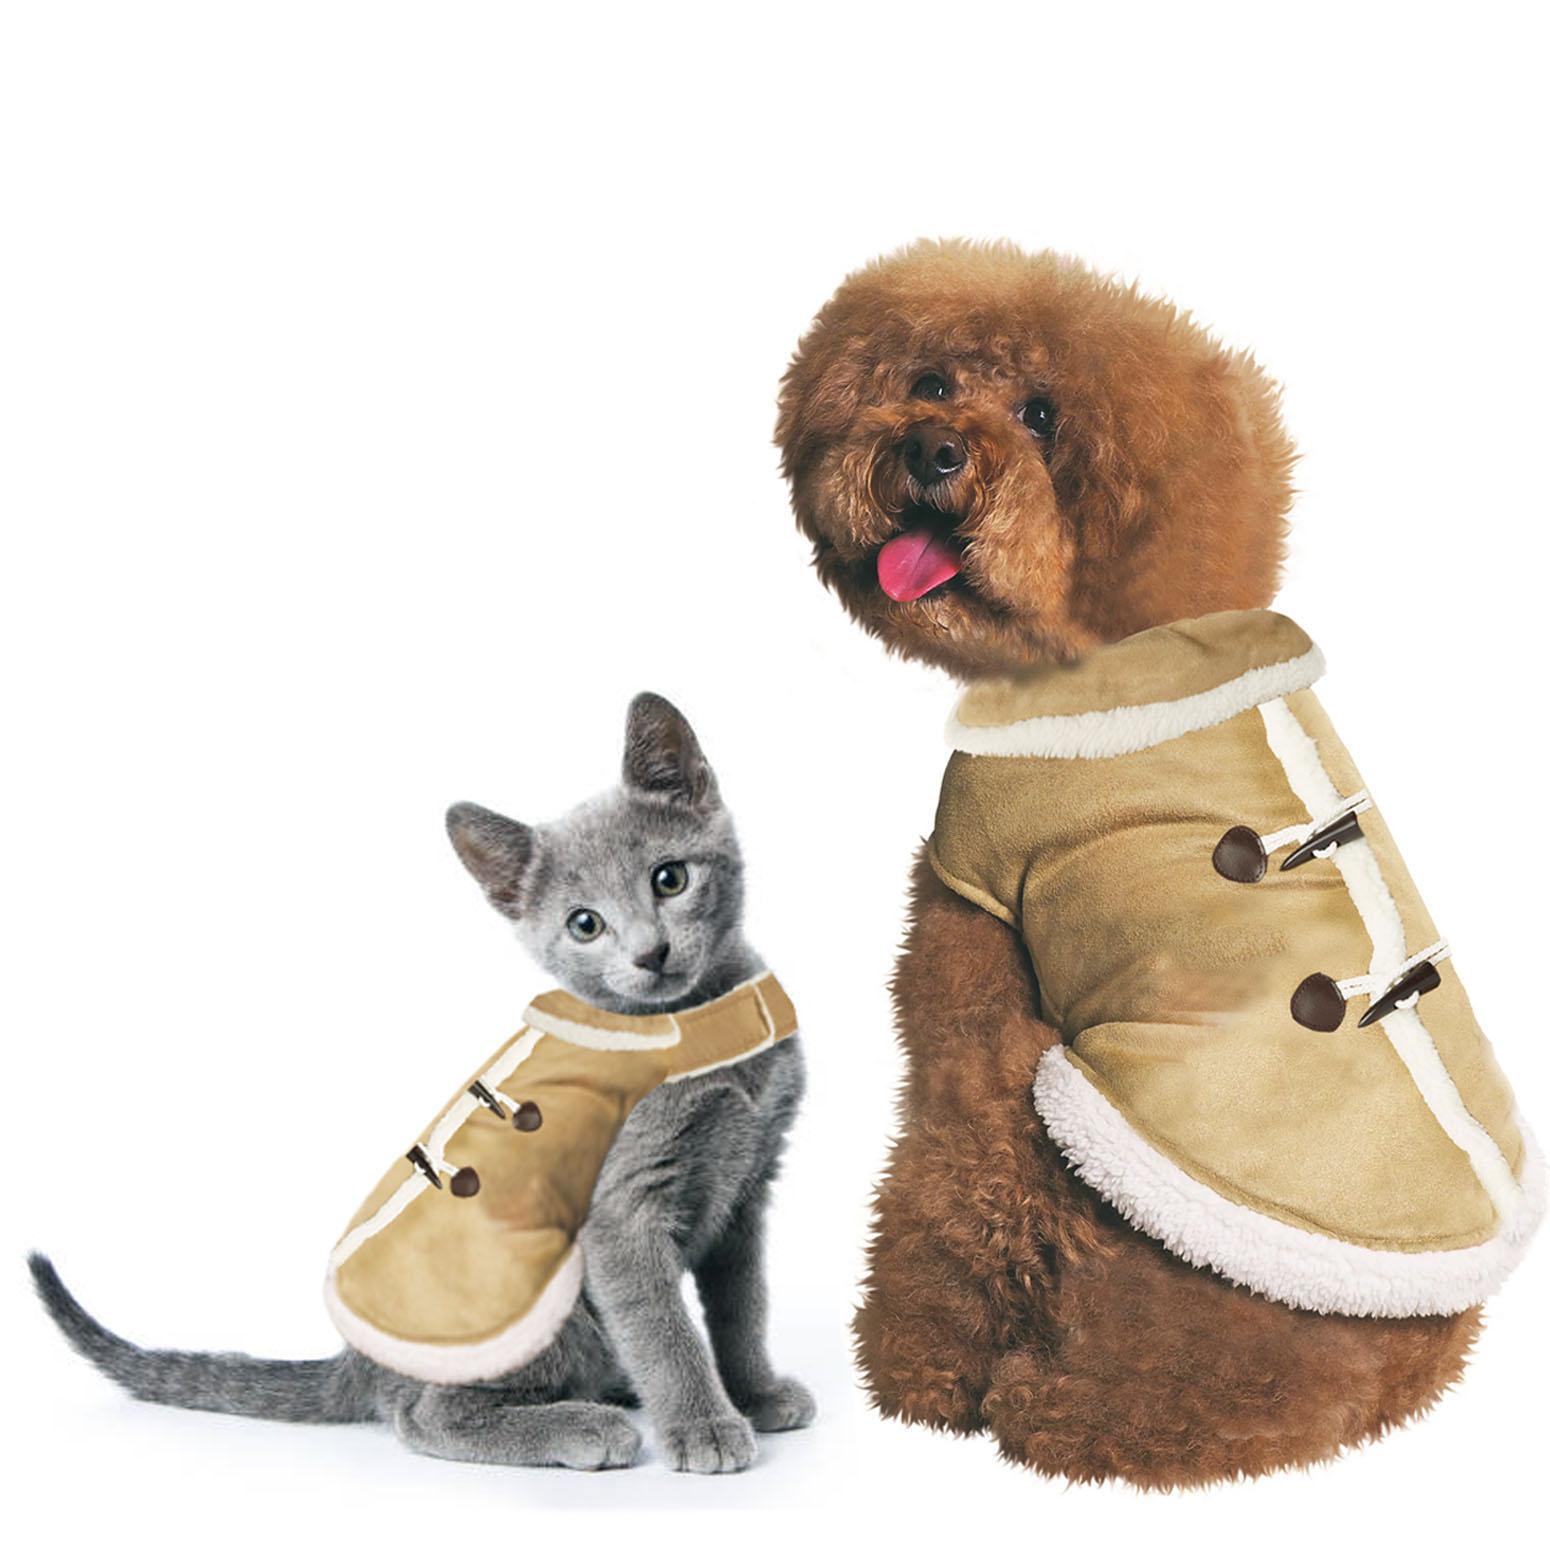 Pet Jackets - YMMV Walmart $1.50